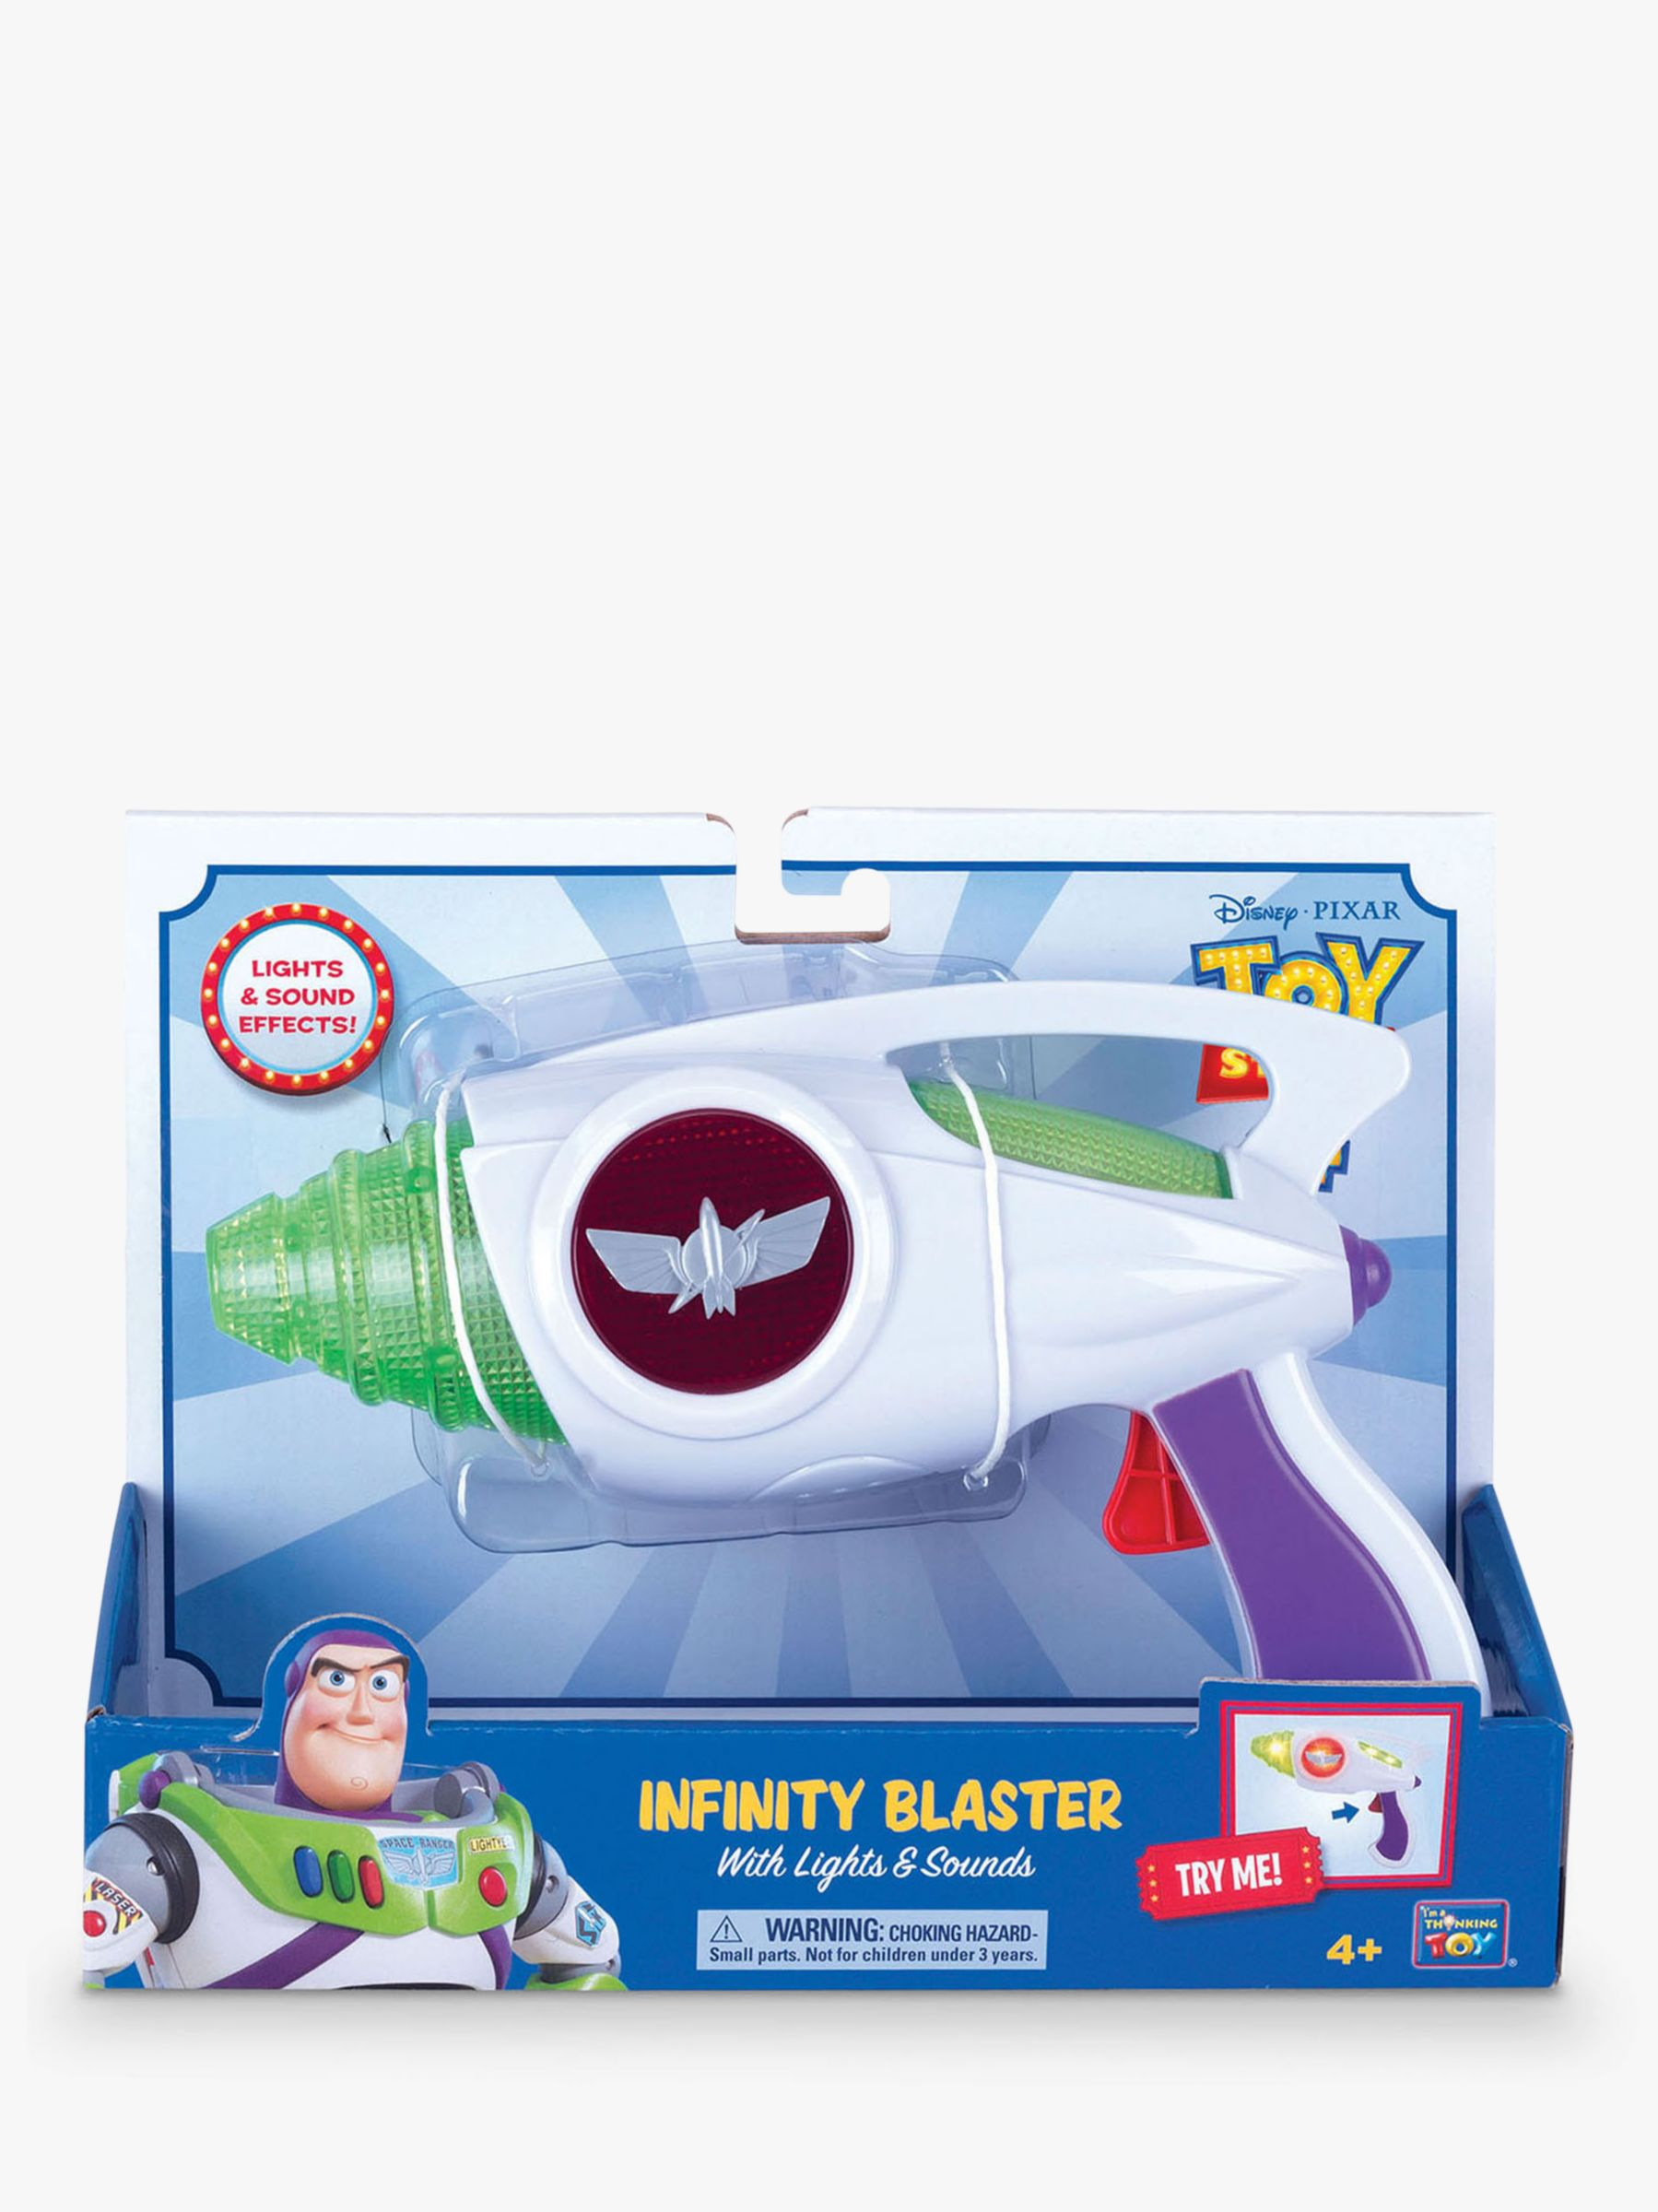 Disney Disney Pixar Toy Story 4 Infinity Blaster